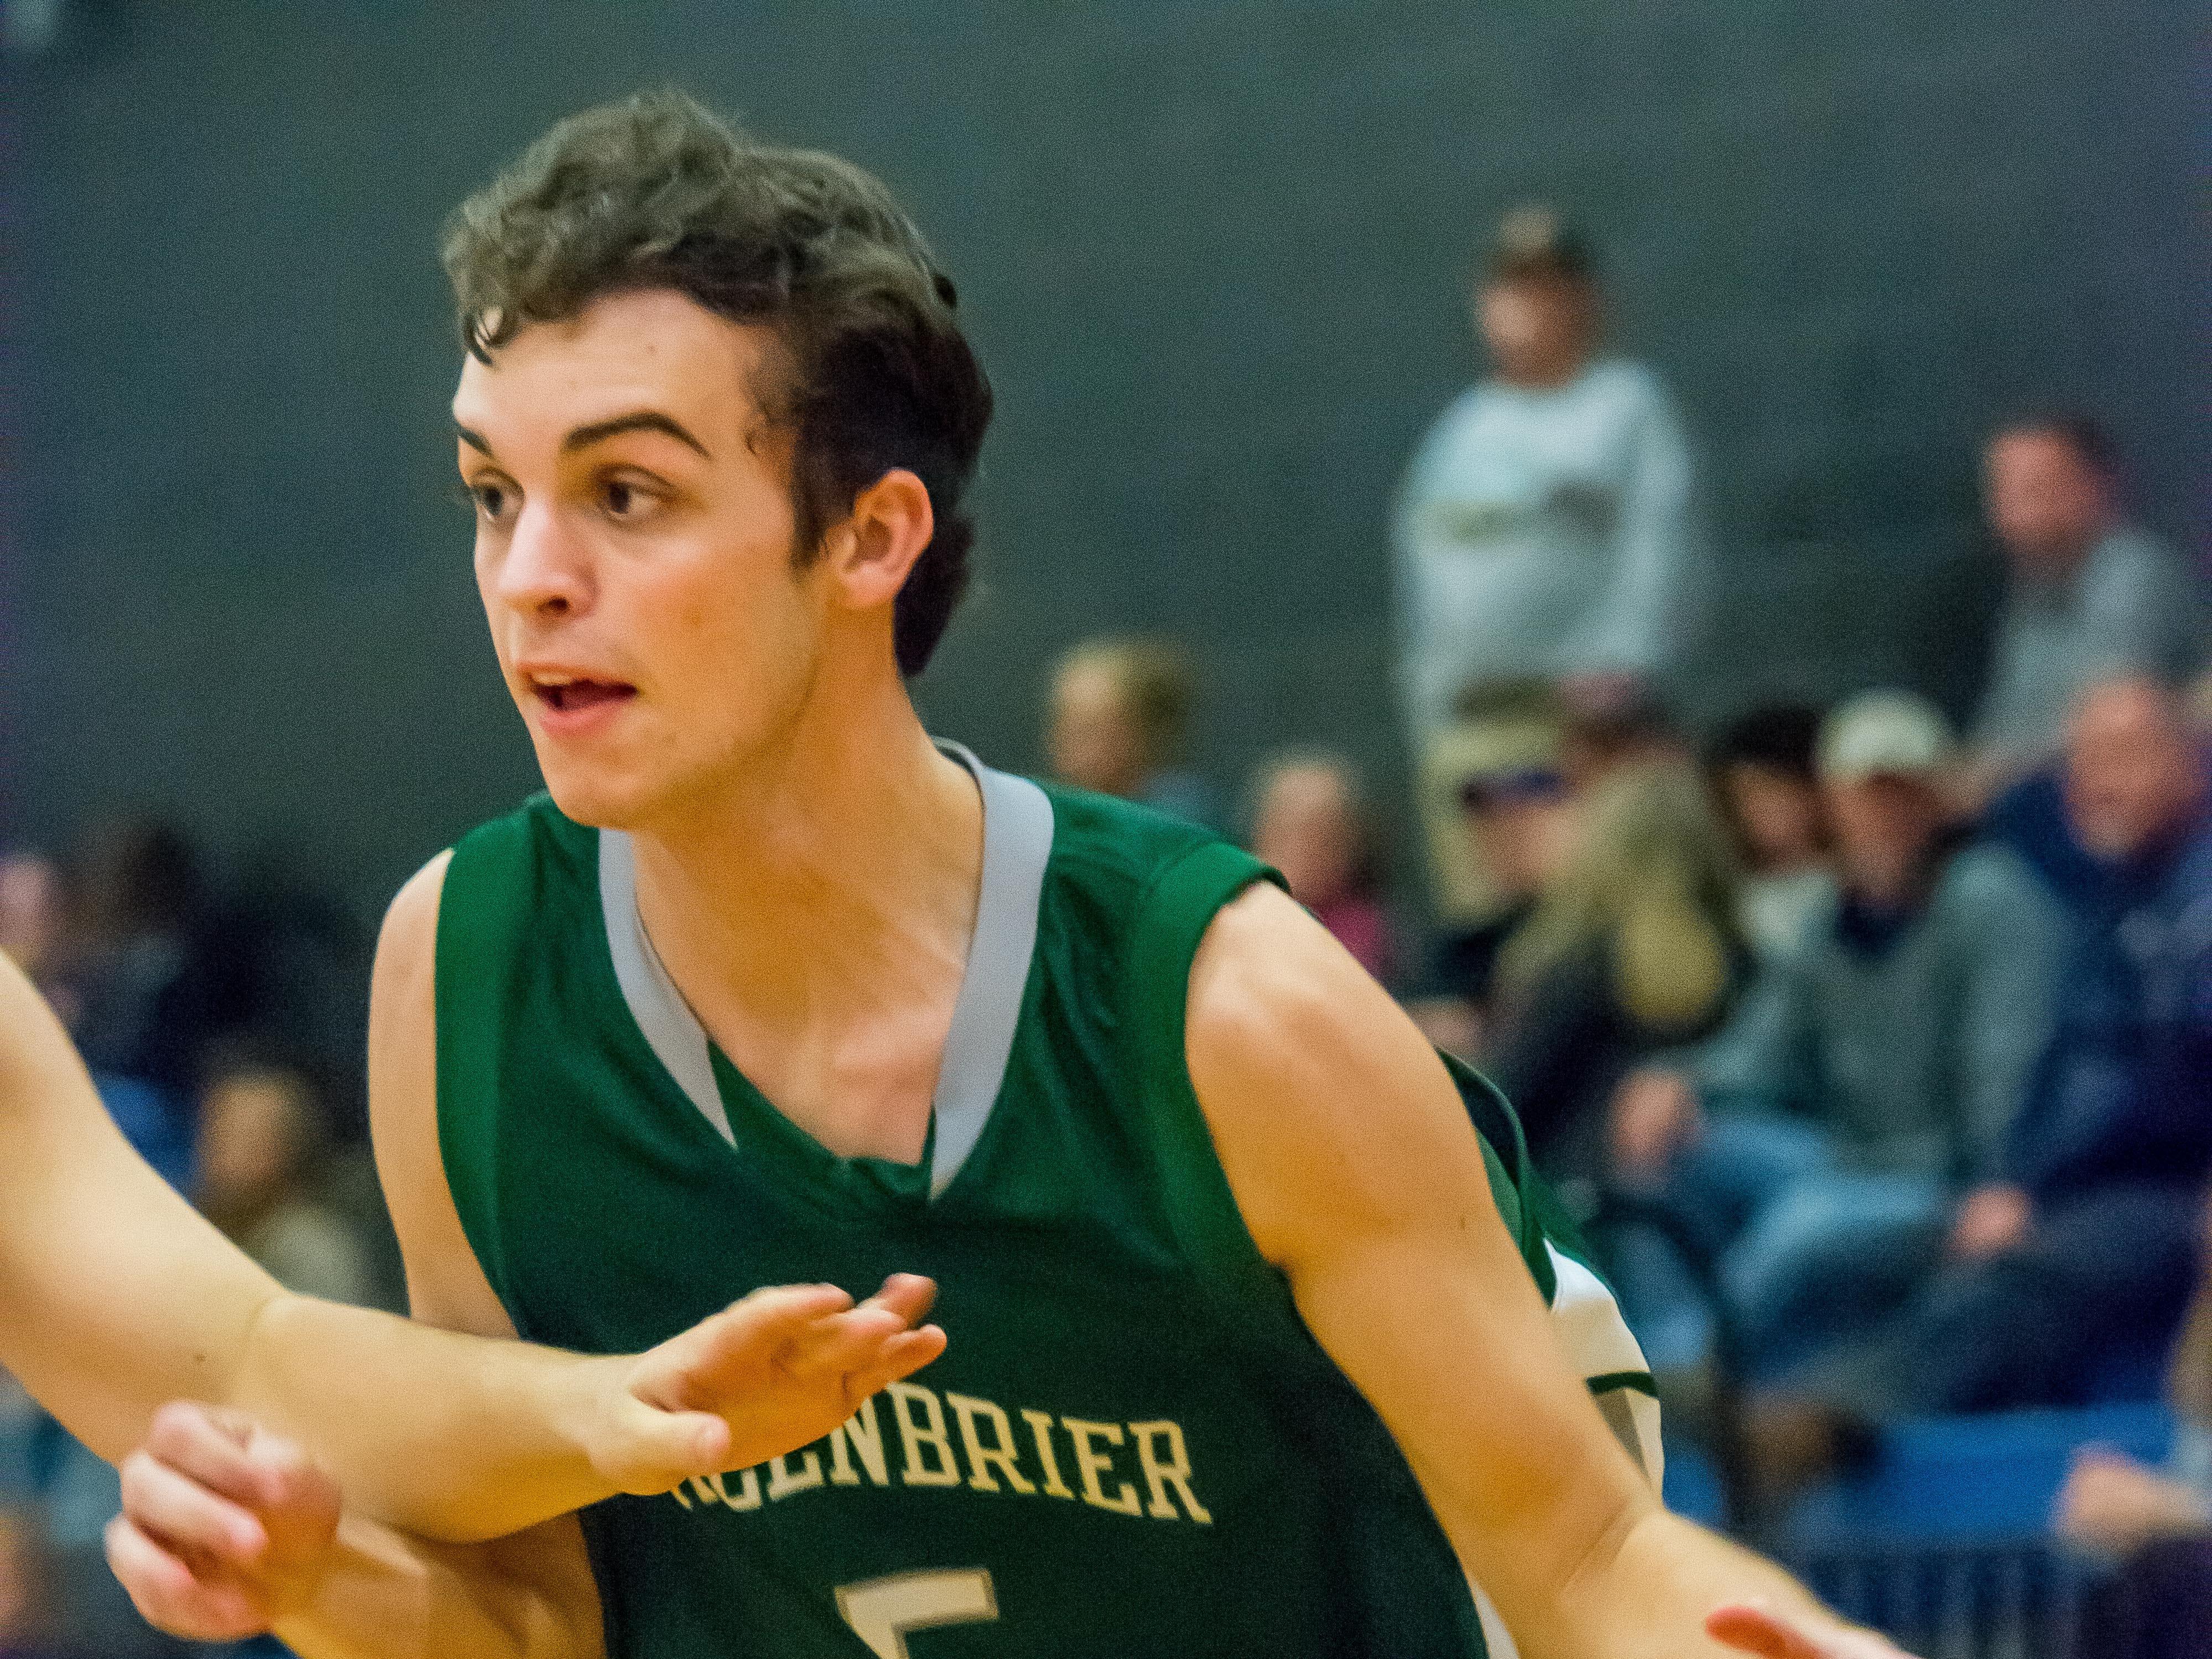 Greenbrier's Jason Hunter drives to the basket against Harpeth.